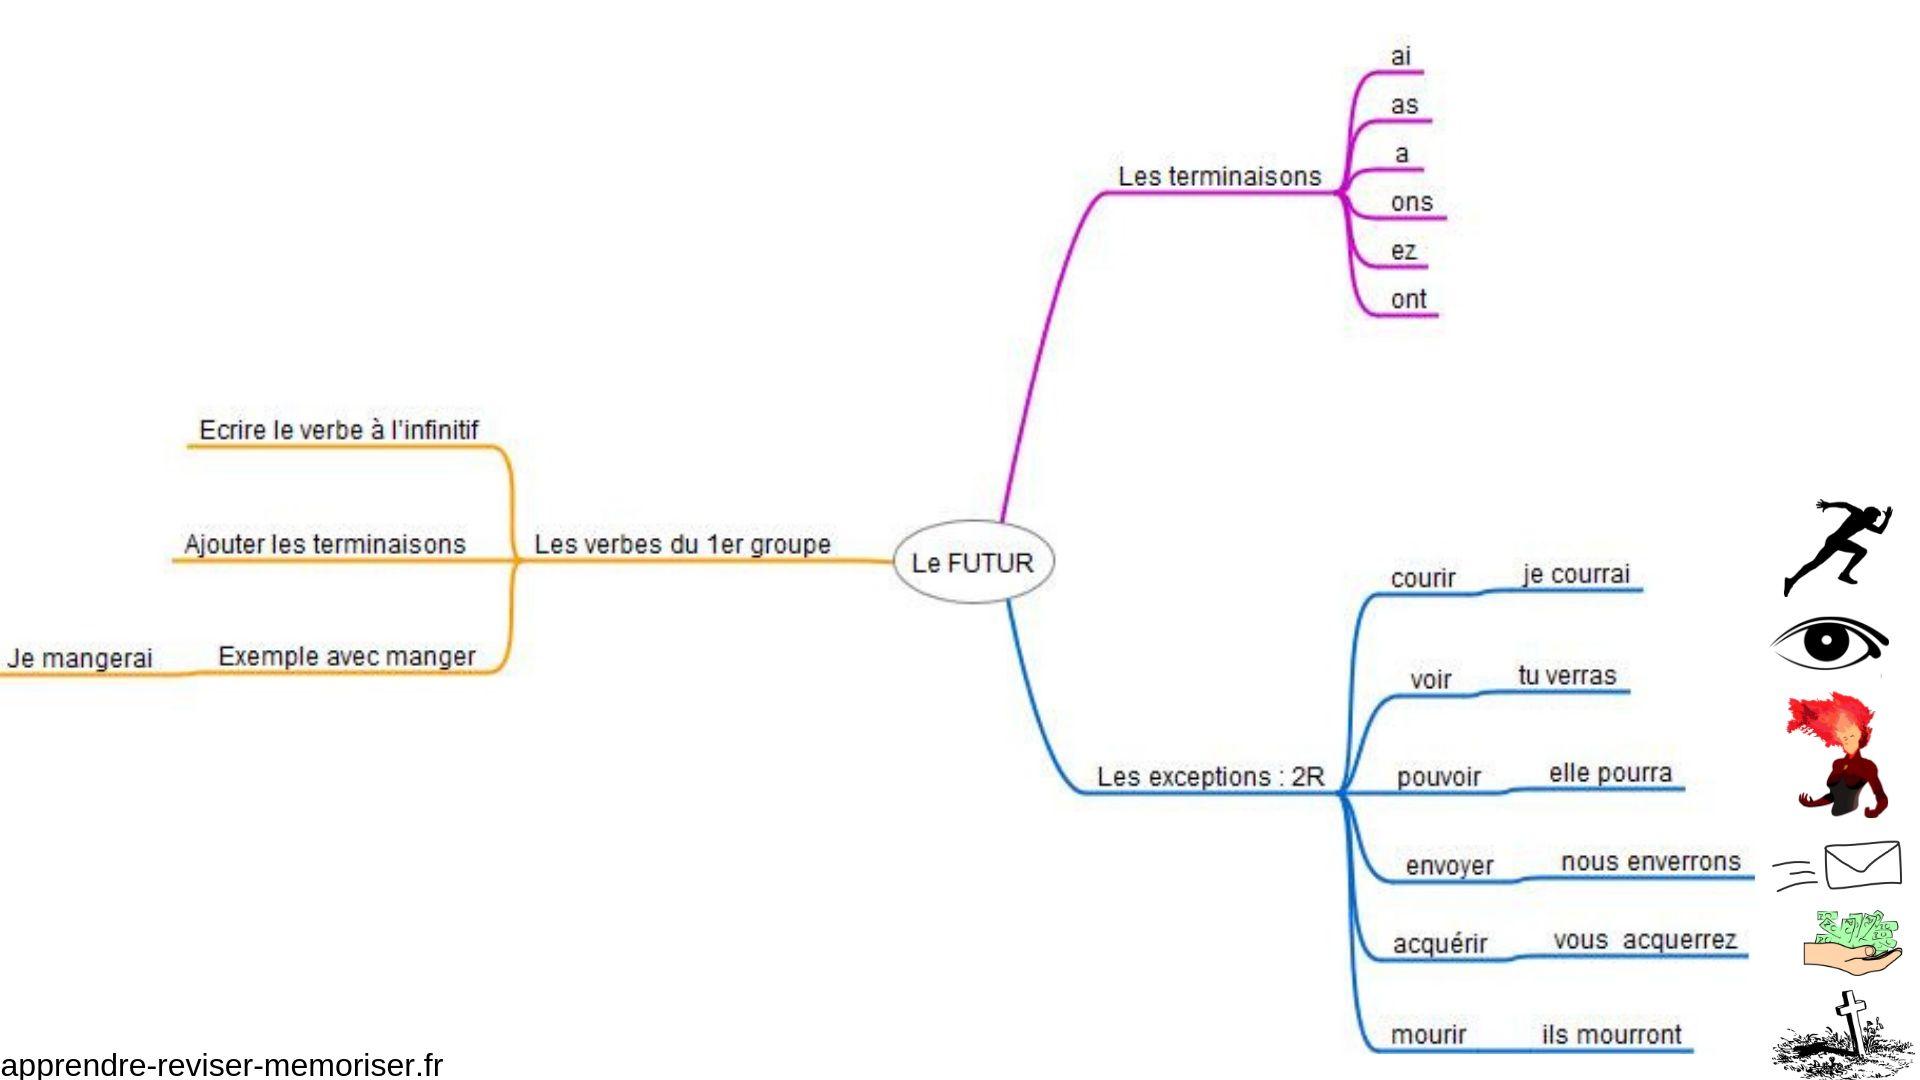 Conjugaison Carte Mentale Du Futur De L Indicatif Apprendre Reviser Memoriser